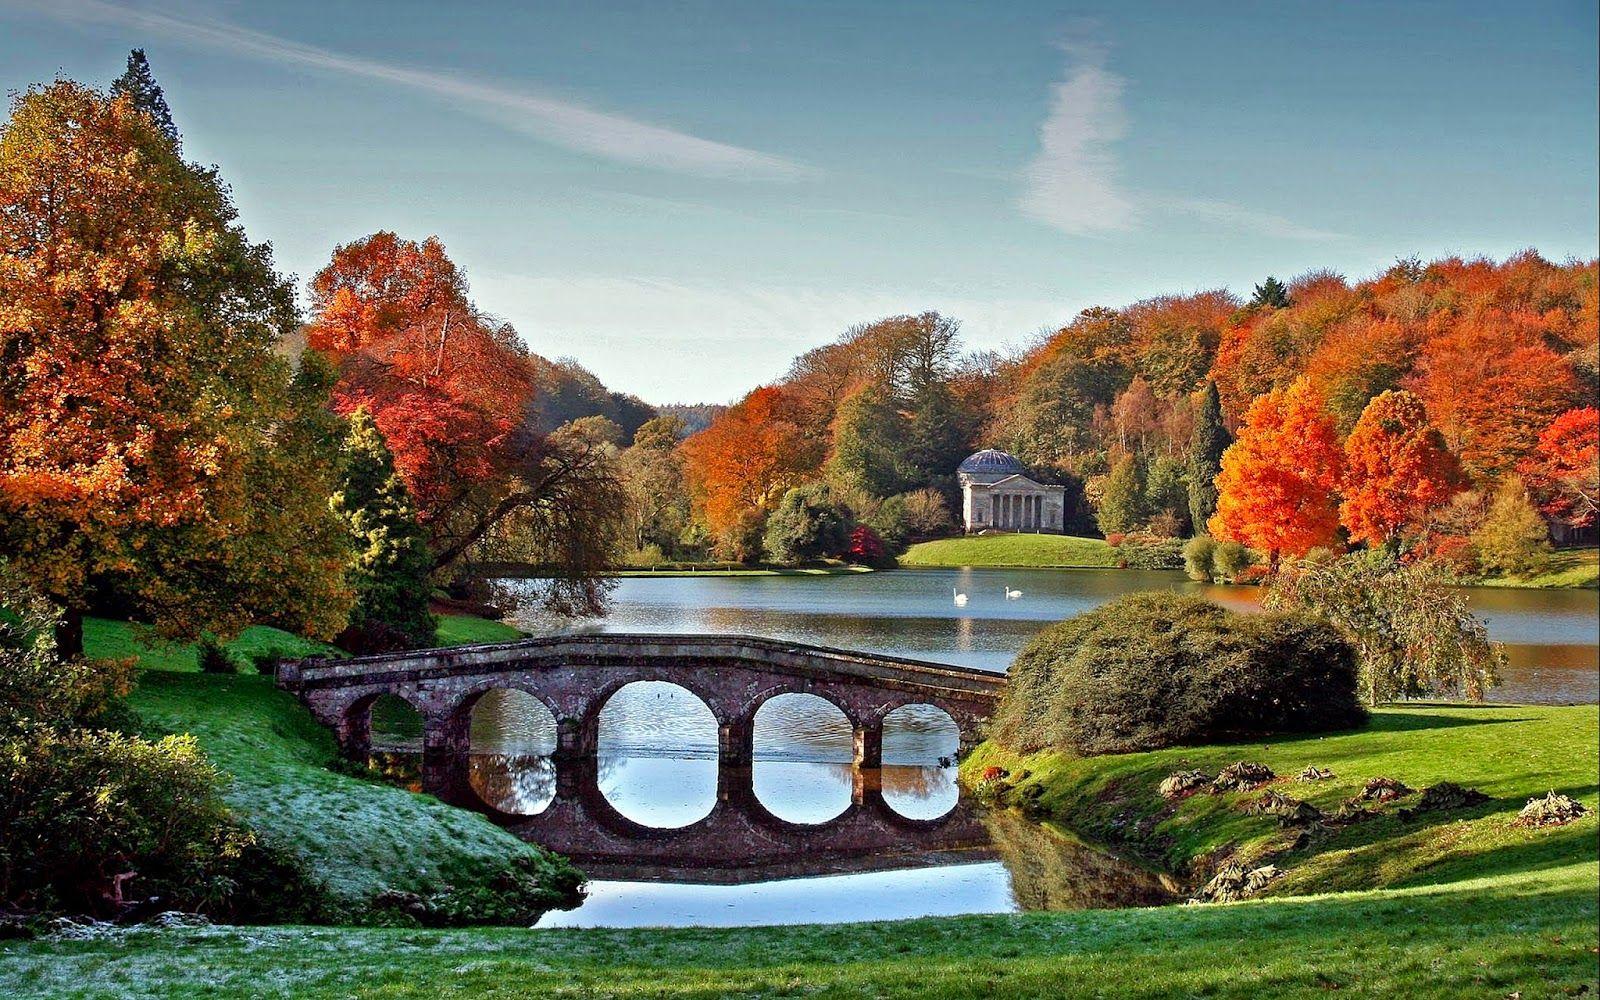 ec03f02ee1f2b3ea096392492f4599e8 - Best Time To Visit Stourhead Gardens